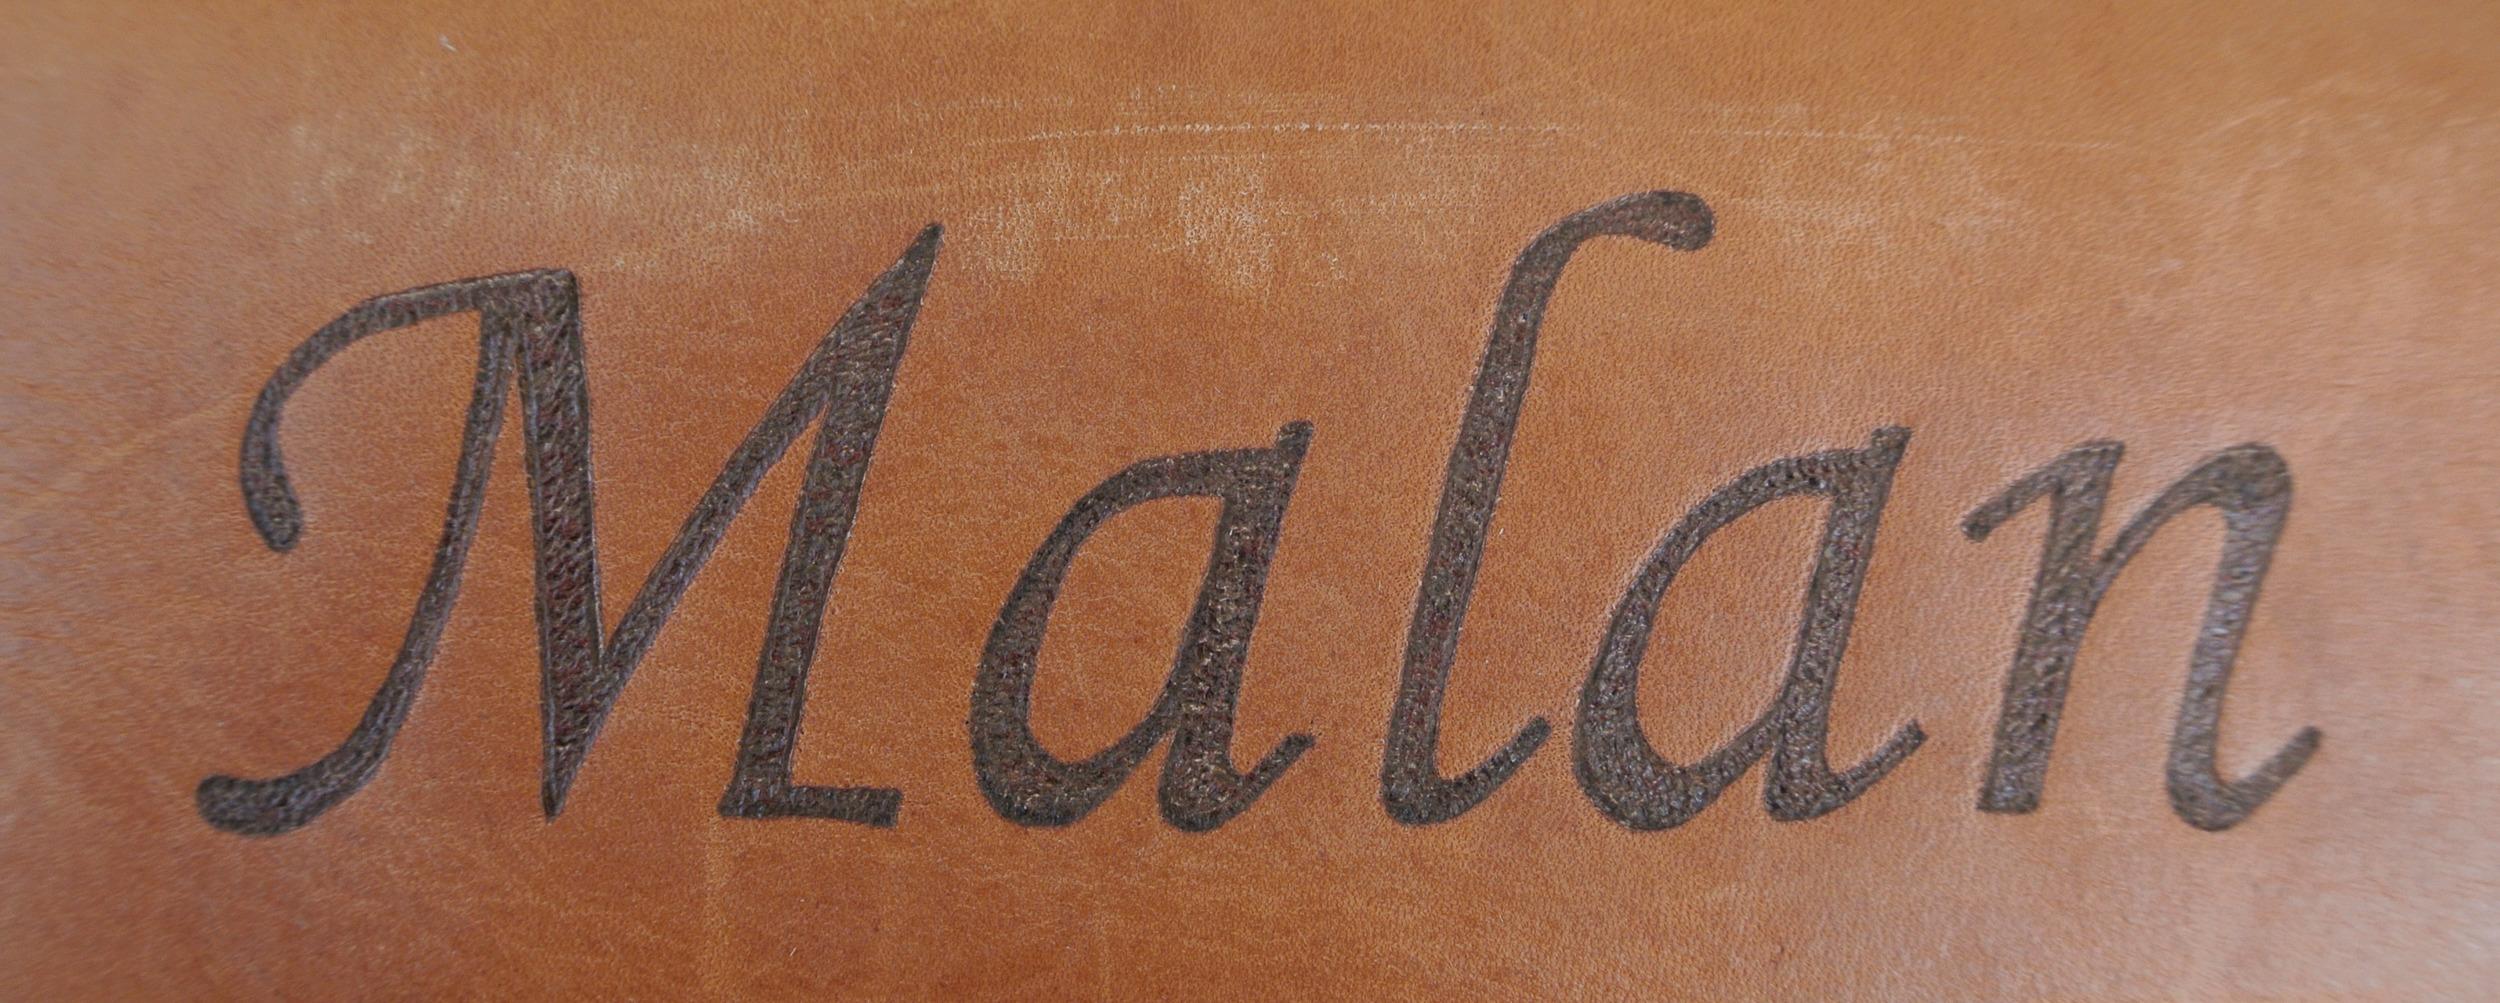 Circle M-Brand heat engraving Last Name.JPG